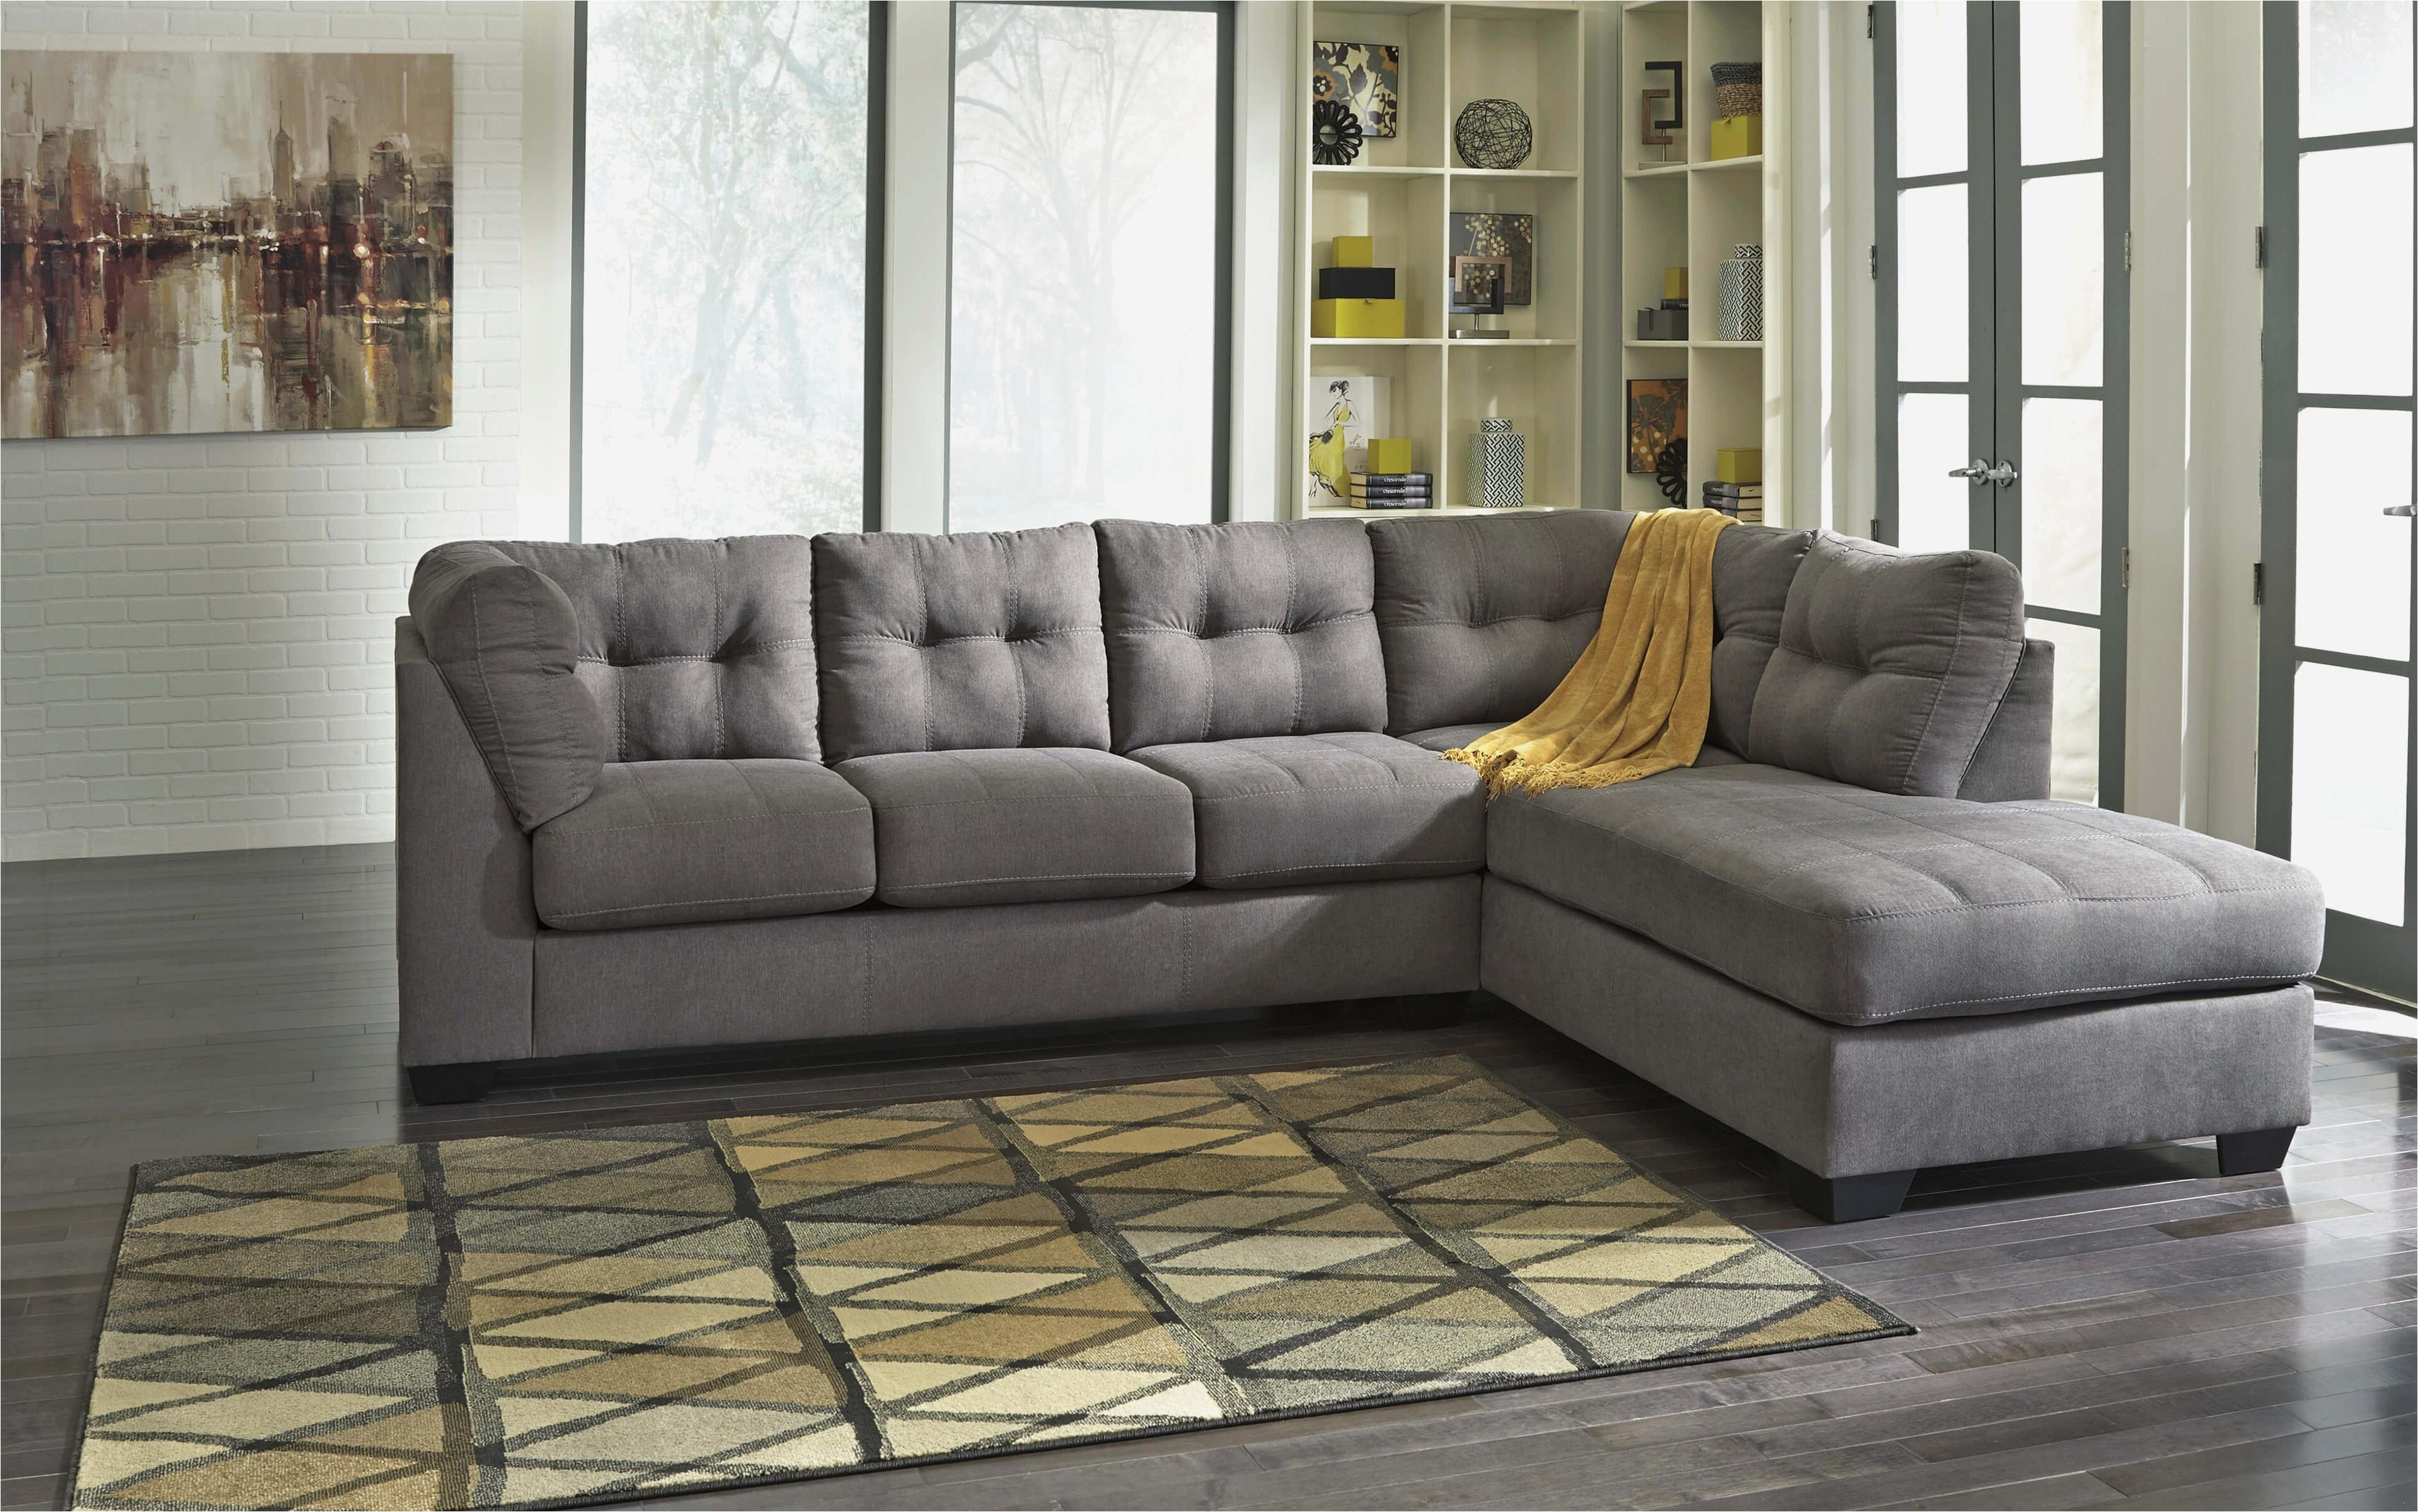 Featured Photo of Nebraska Furniture Mart Sectional Sofas